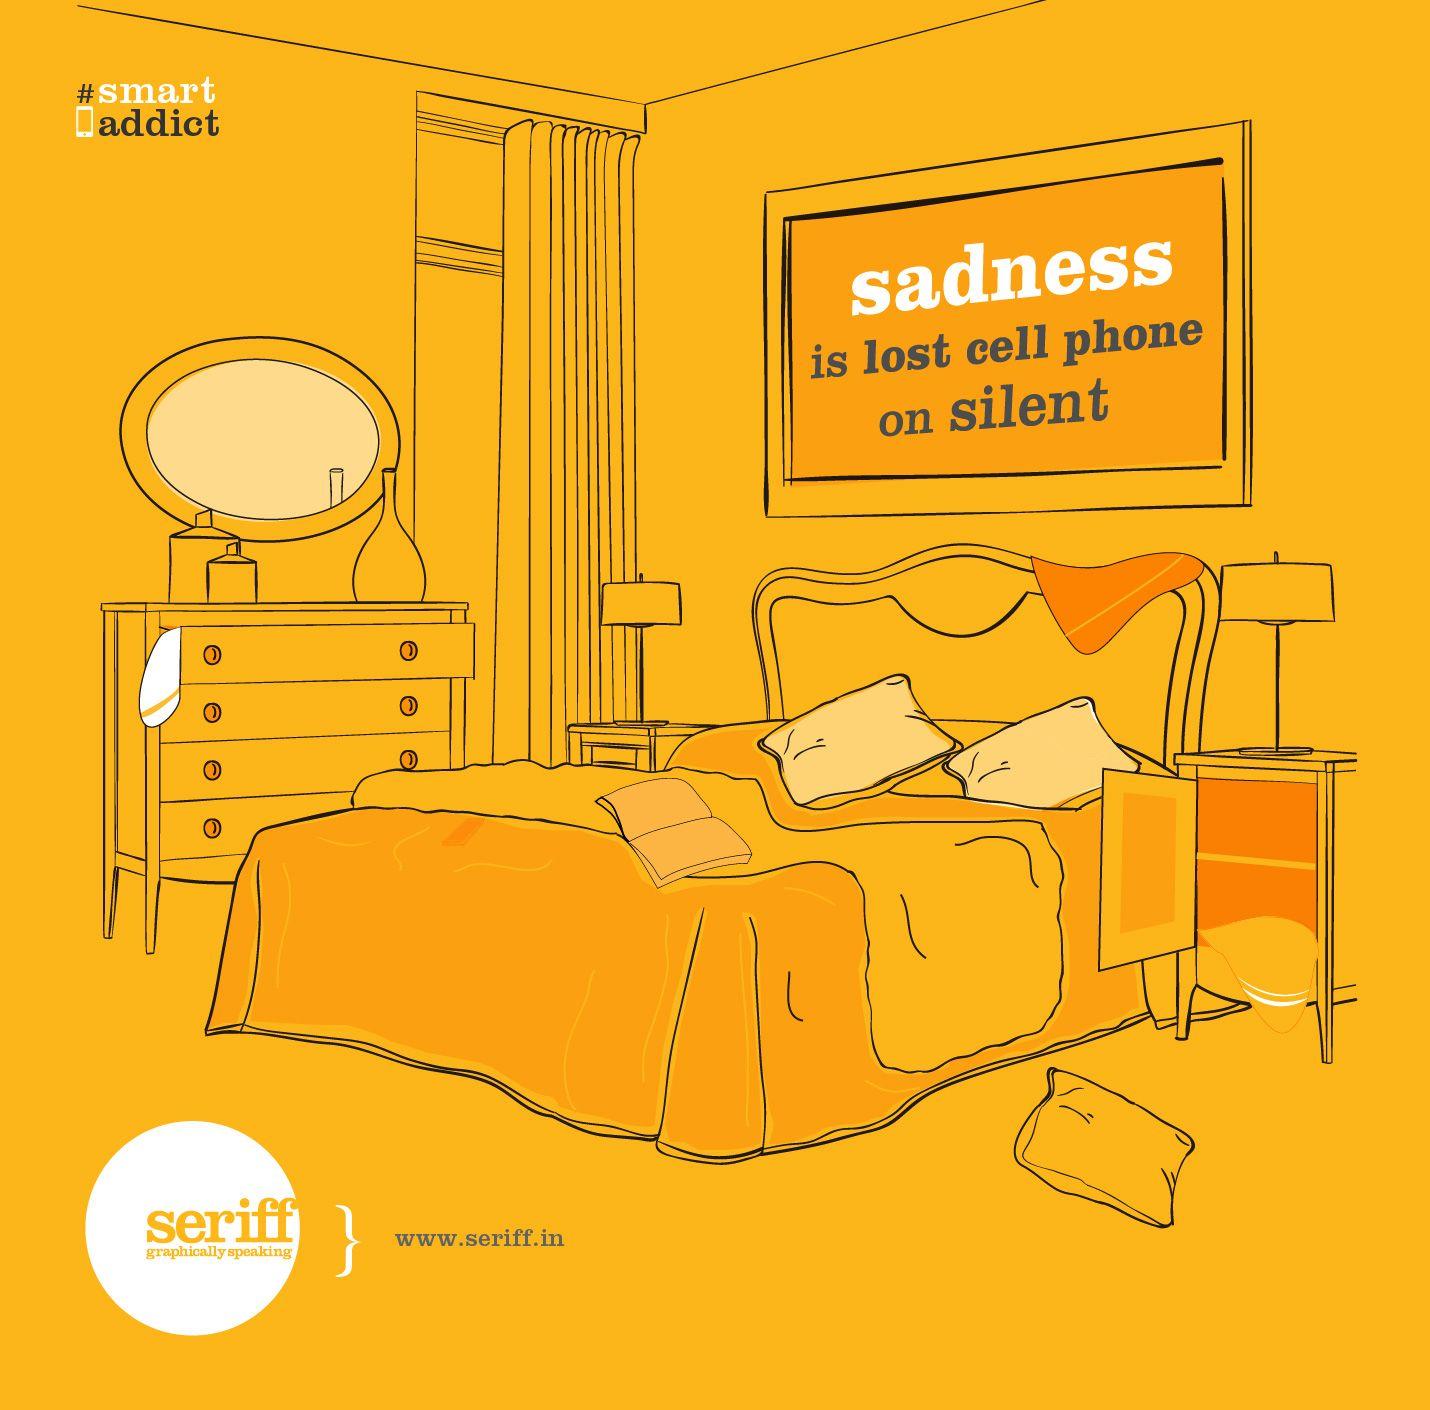 #smartaddict #smartphones #cellphones #socialmedia #sadness #silent #obsession #graphicdesign #Seriff